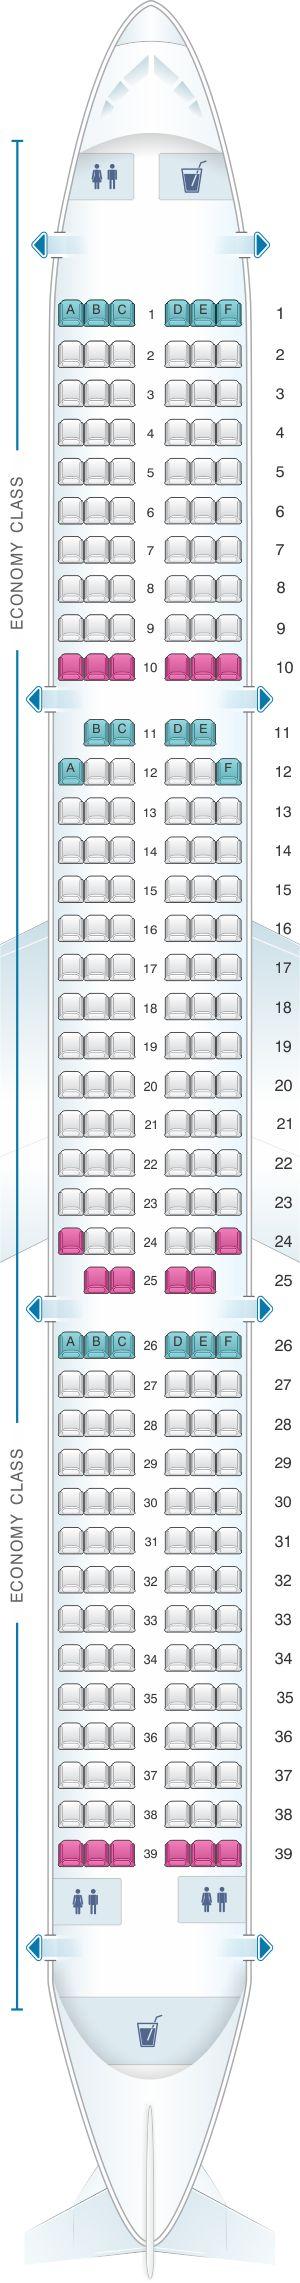 Seat Map Wizz Air Airbus A321 Wizz Air Srilankan